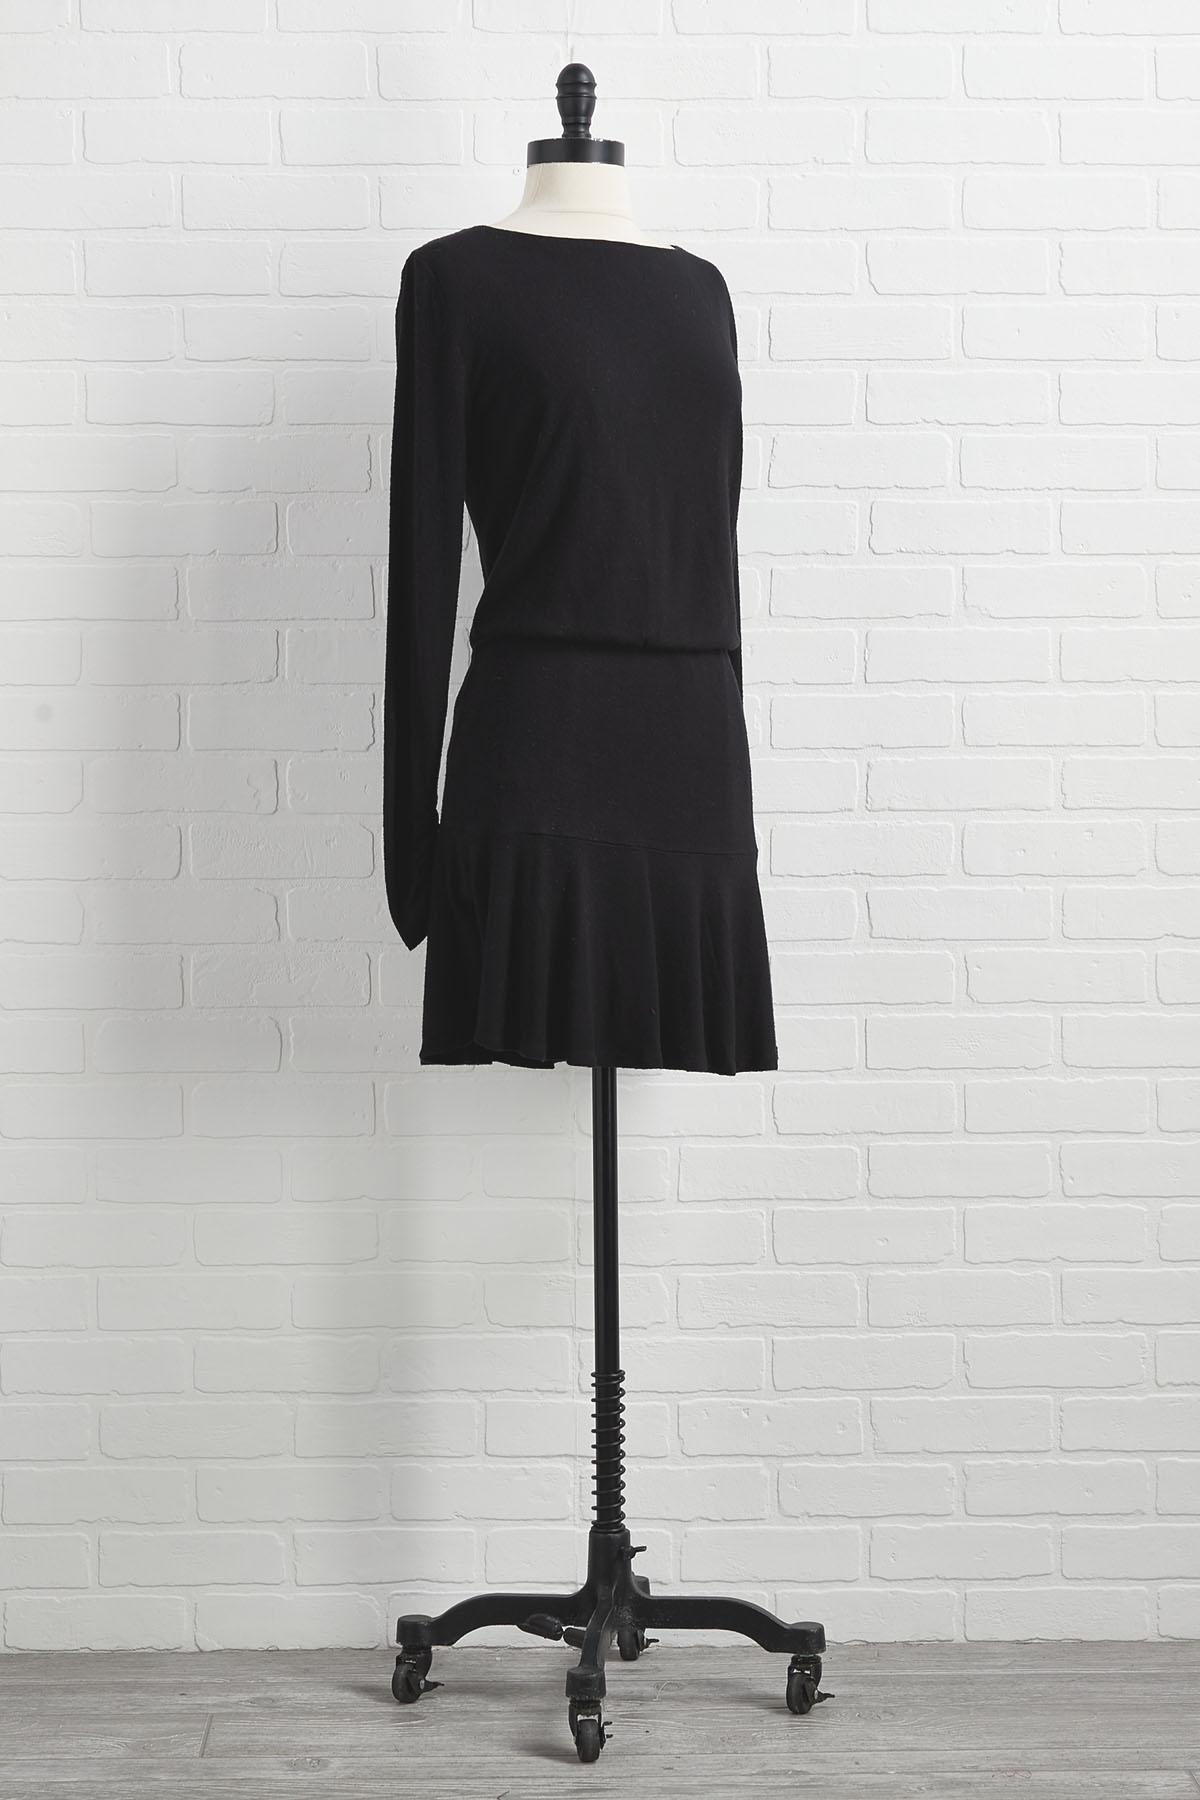 Always A Classic Black Dress